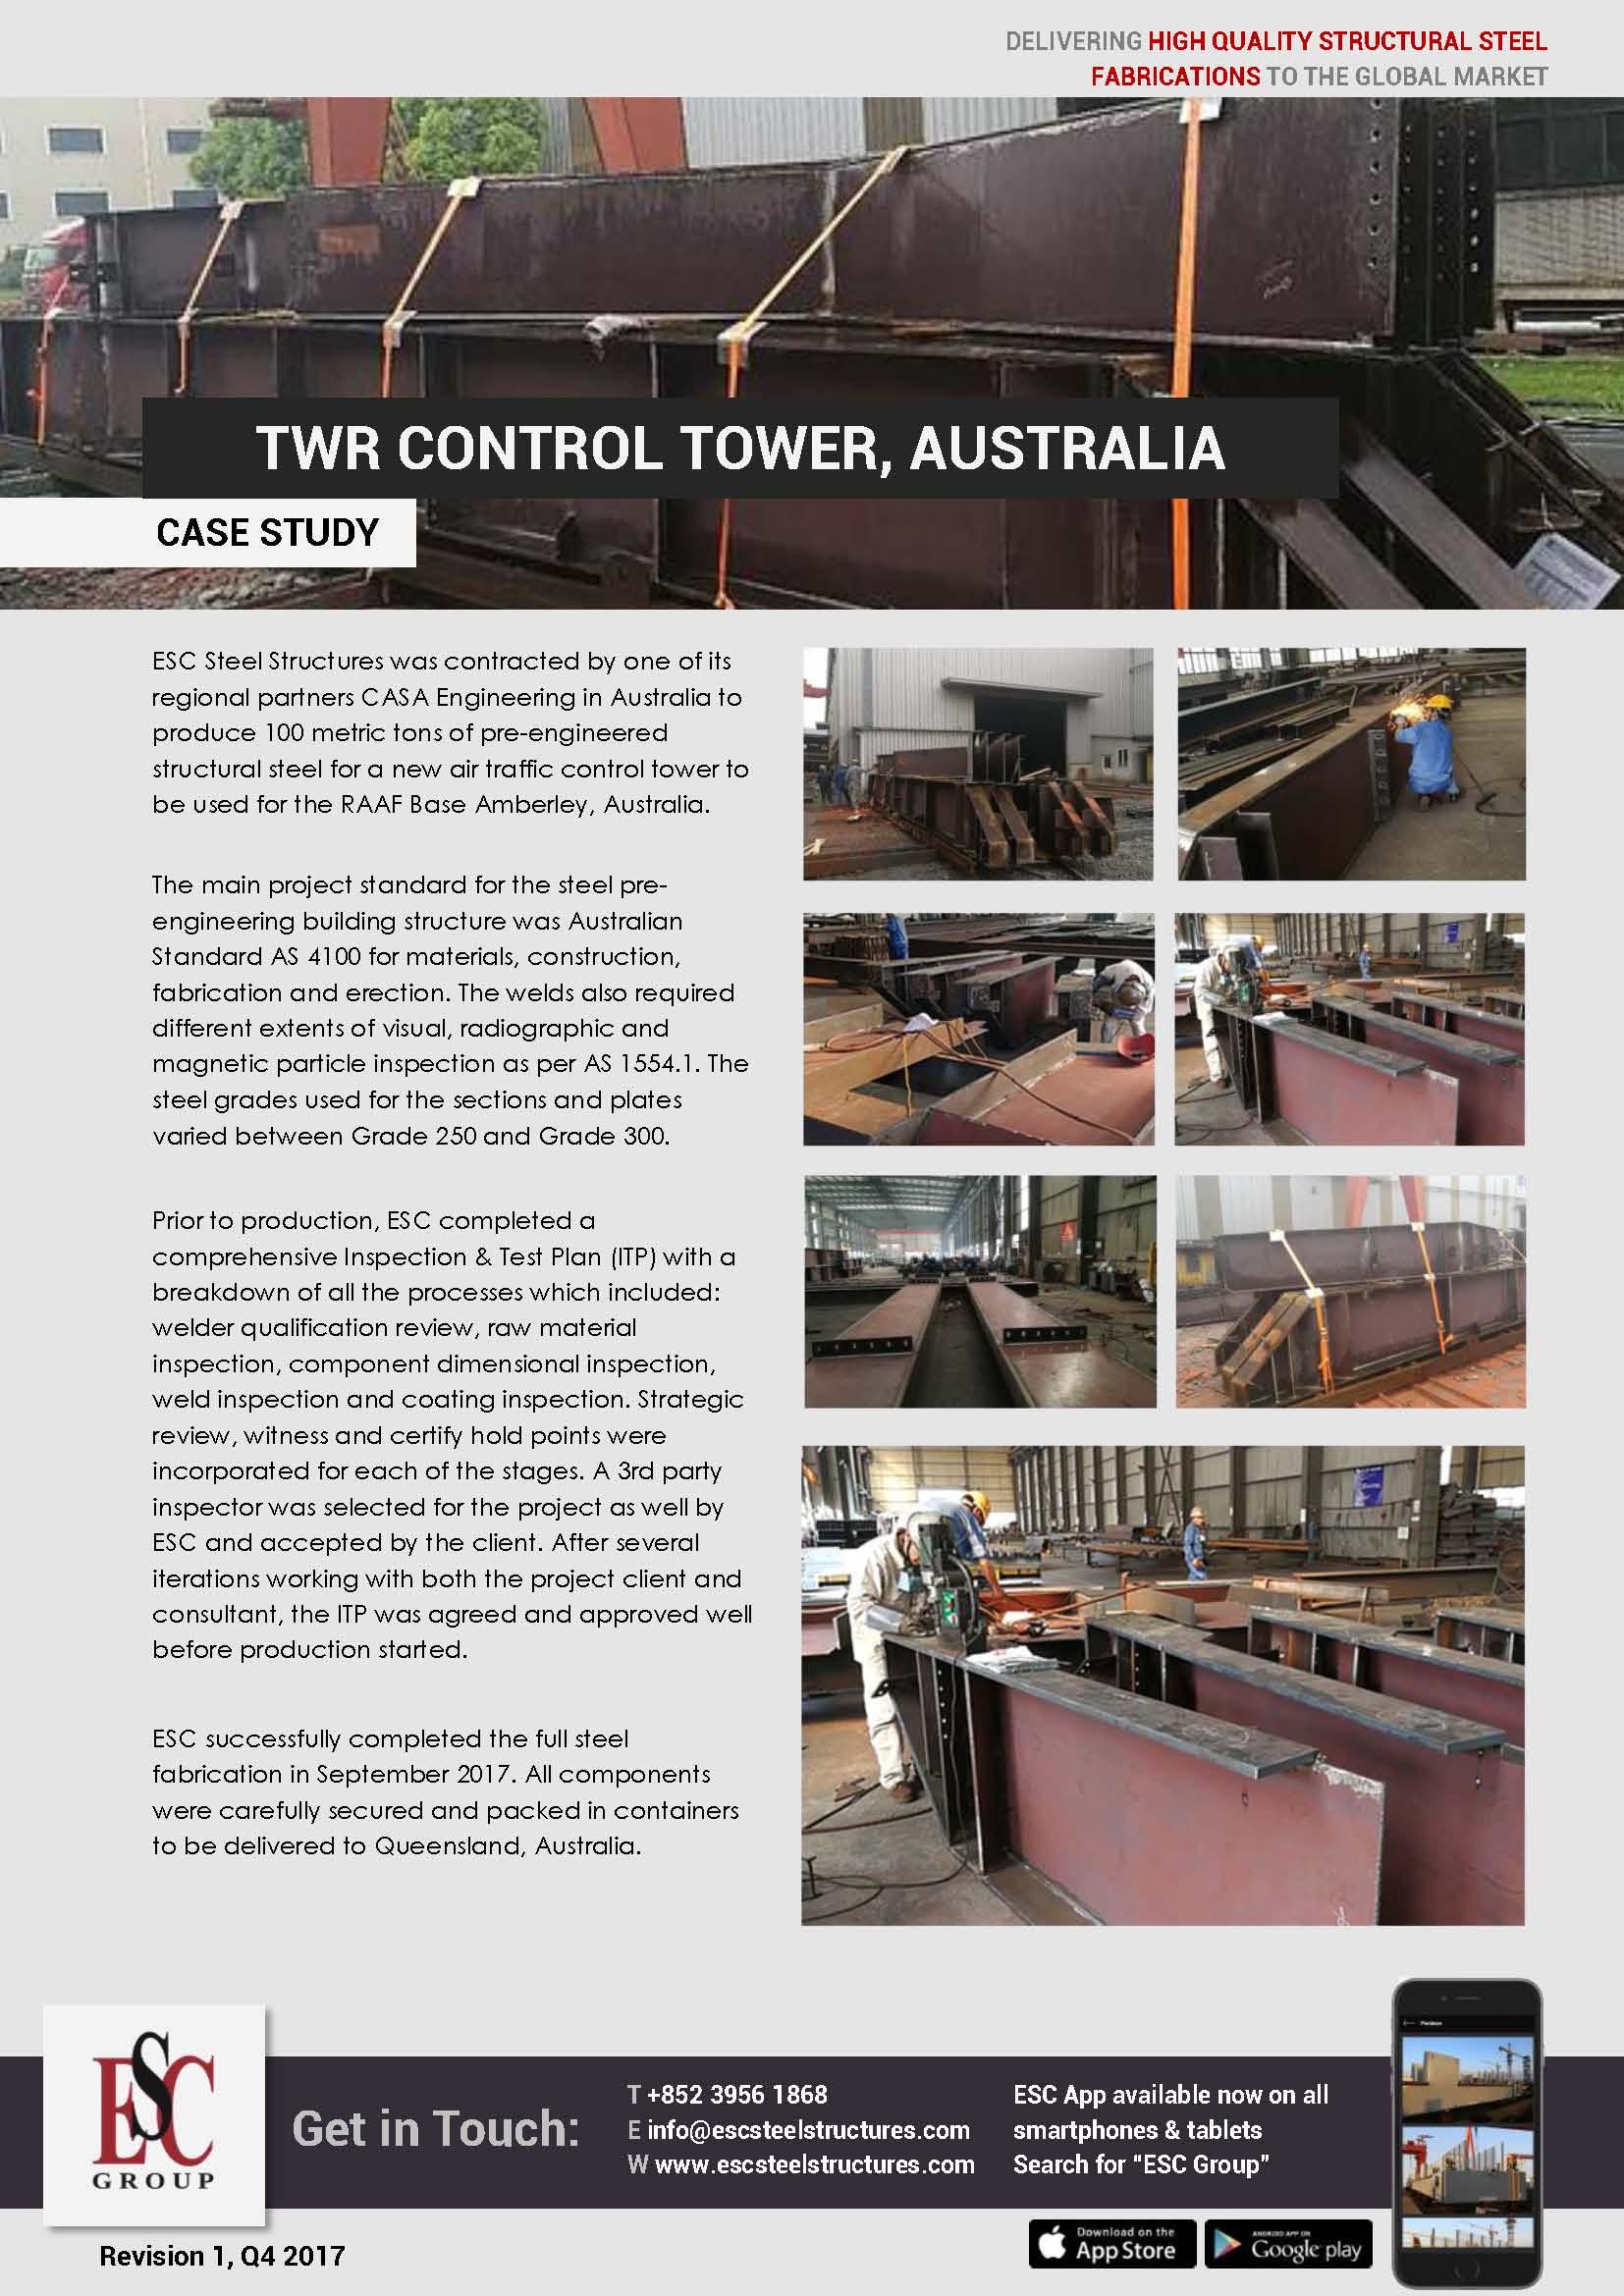 TWR Control Tower